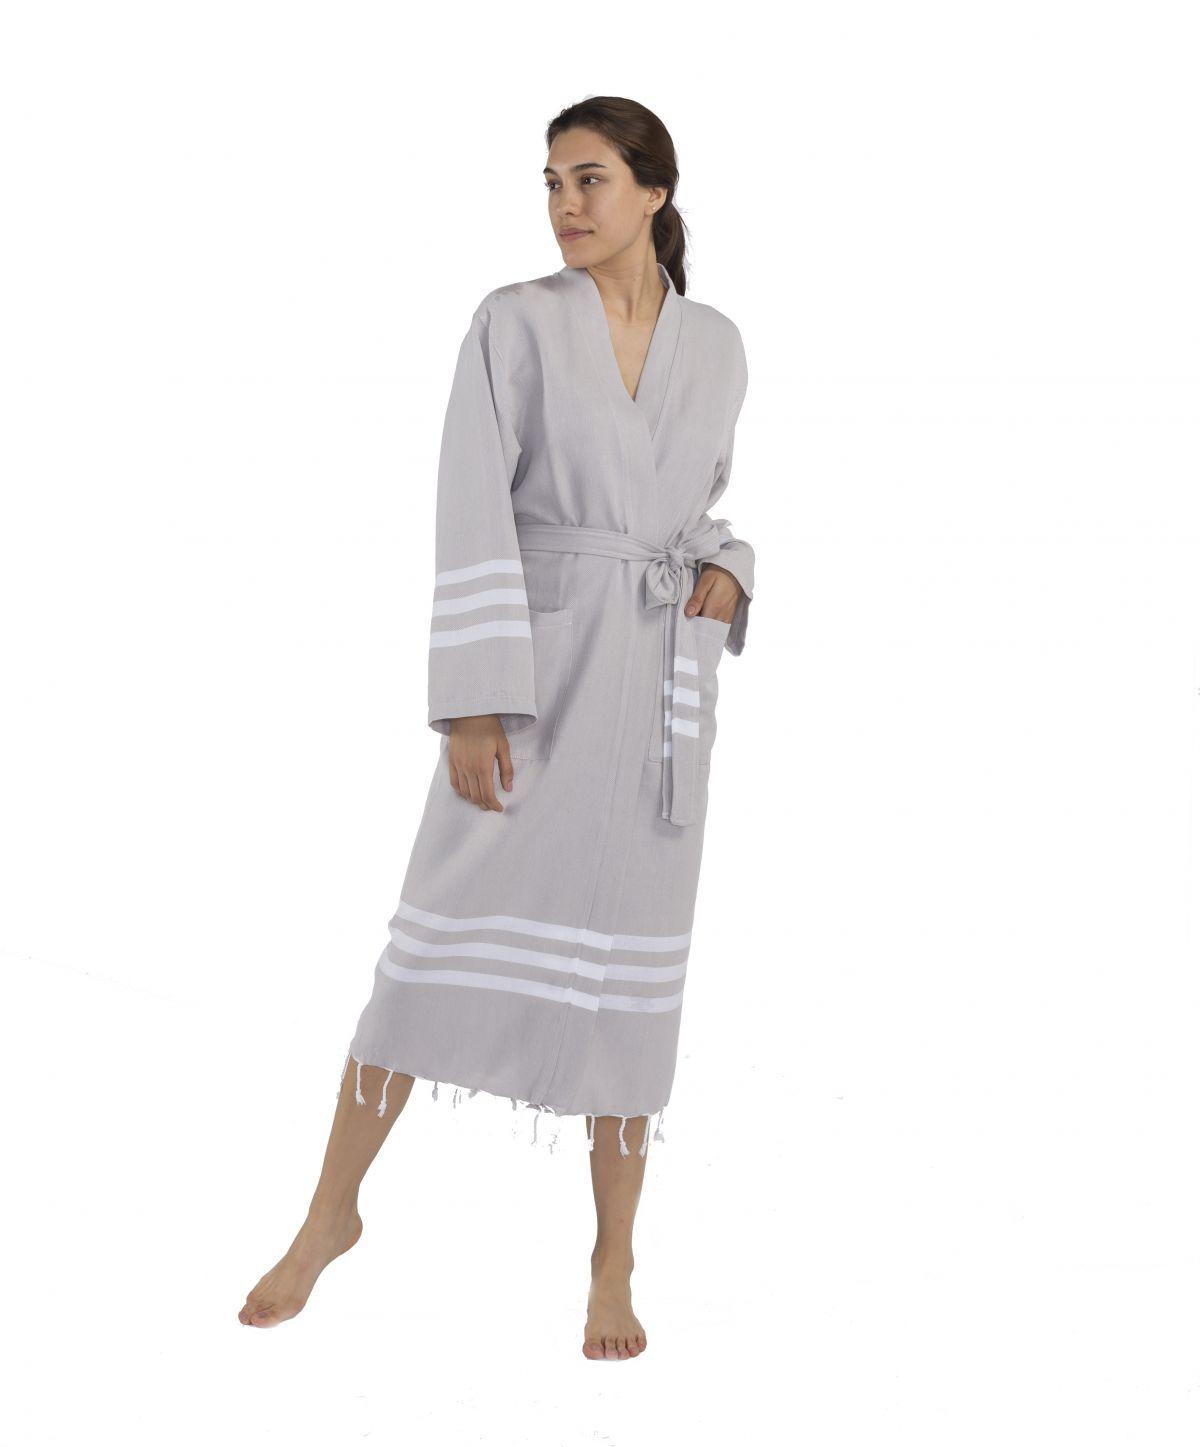 Bathrobe Bala Sultan kimono - Light Grey